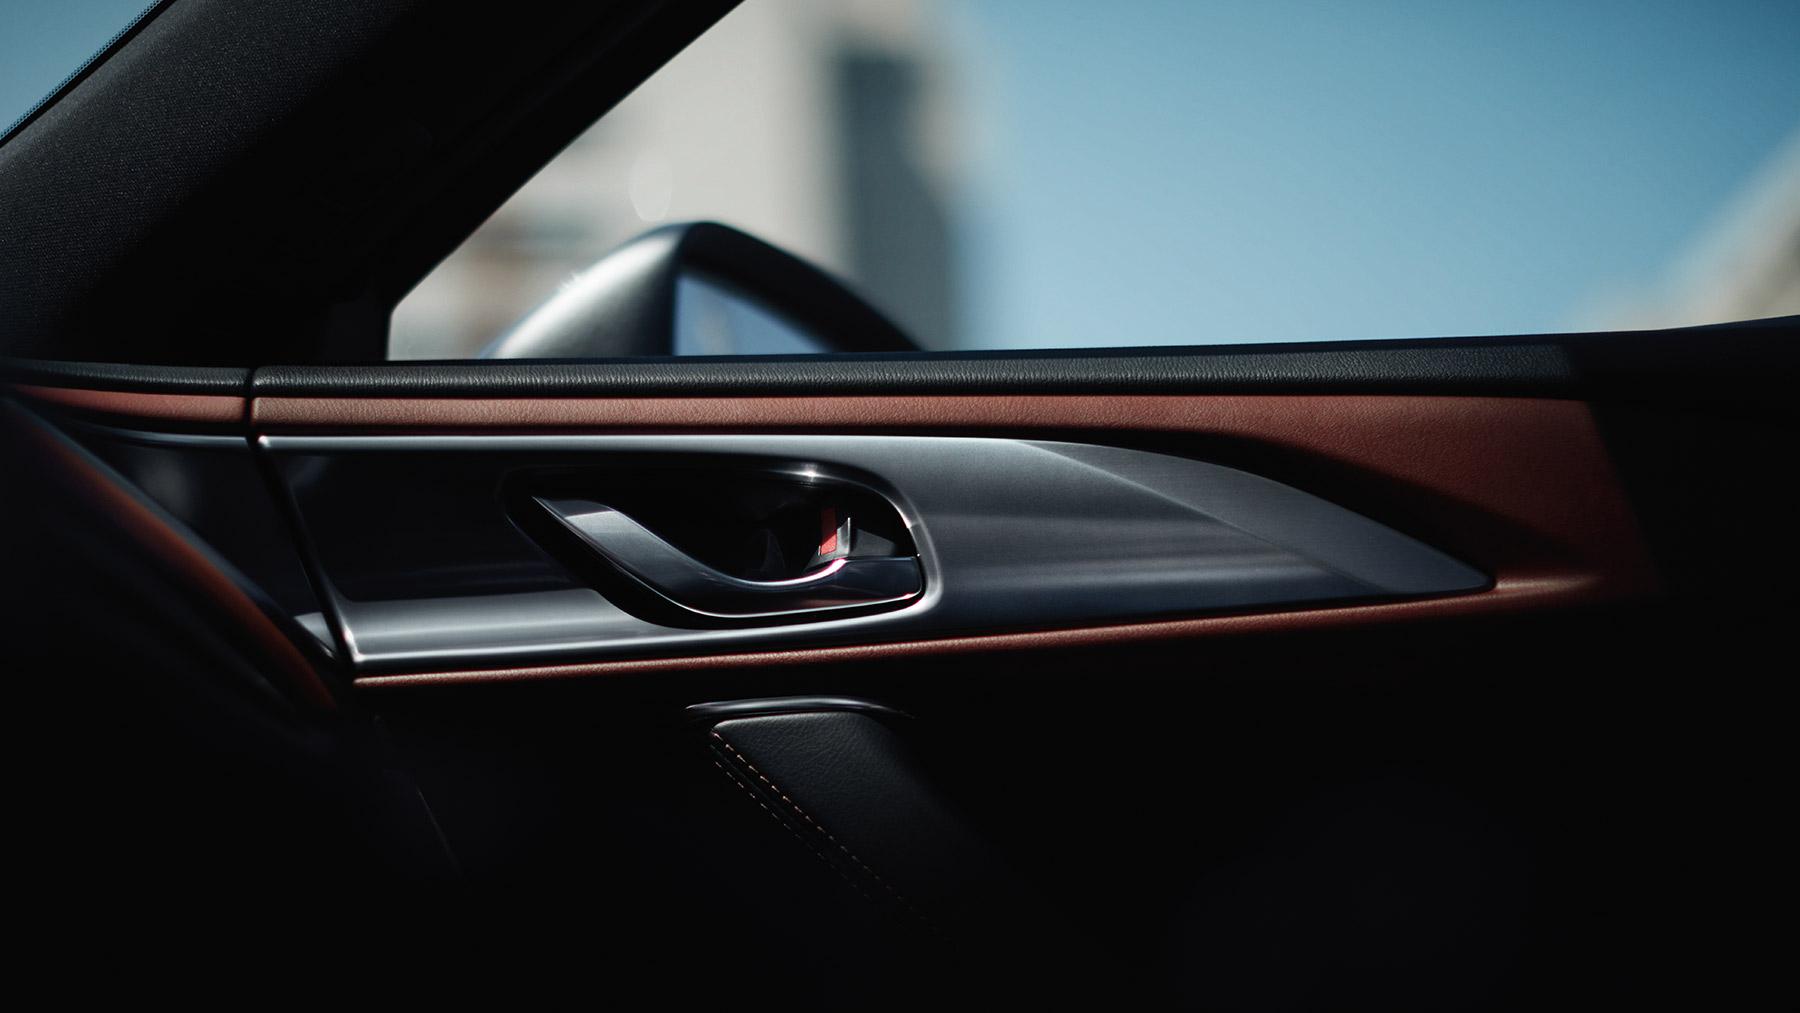 Stunning Design of the 2019 Mazda CX-9